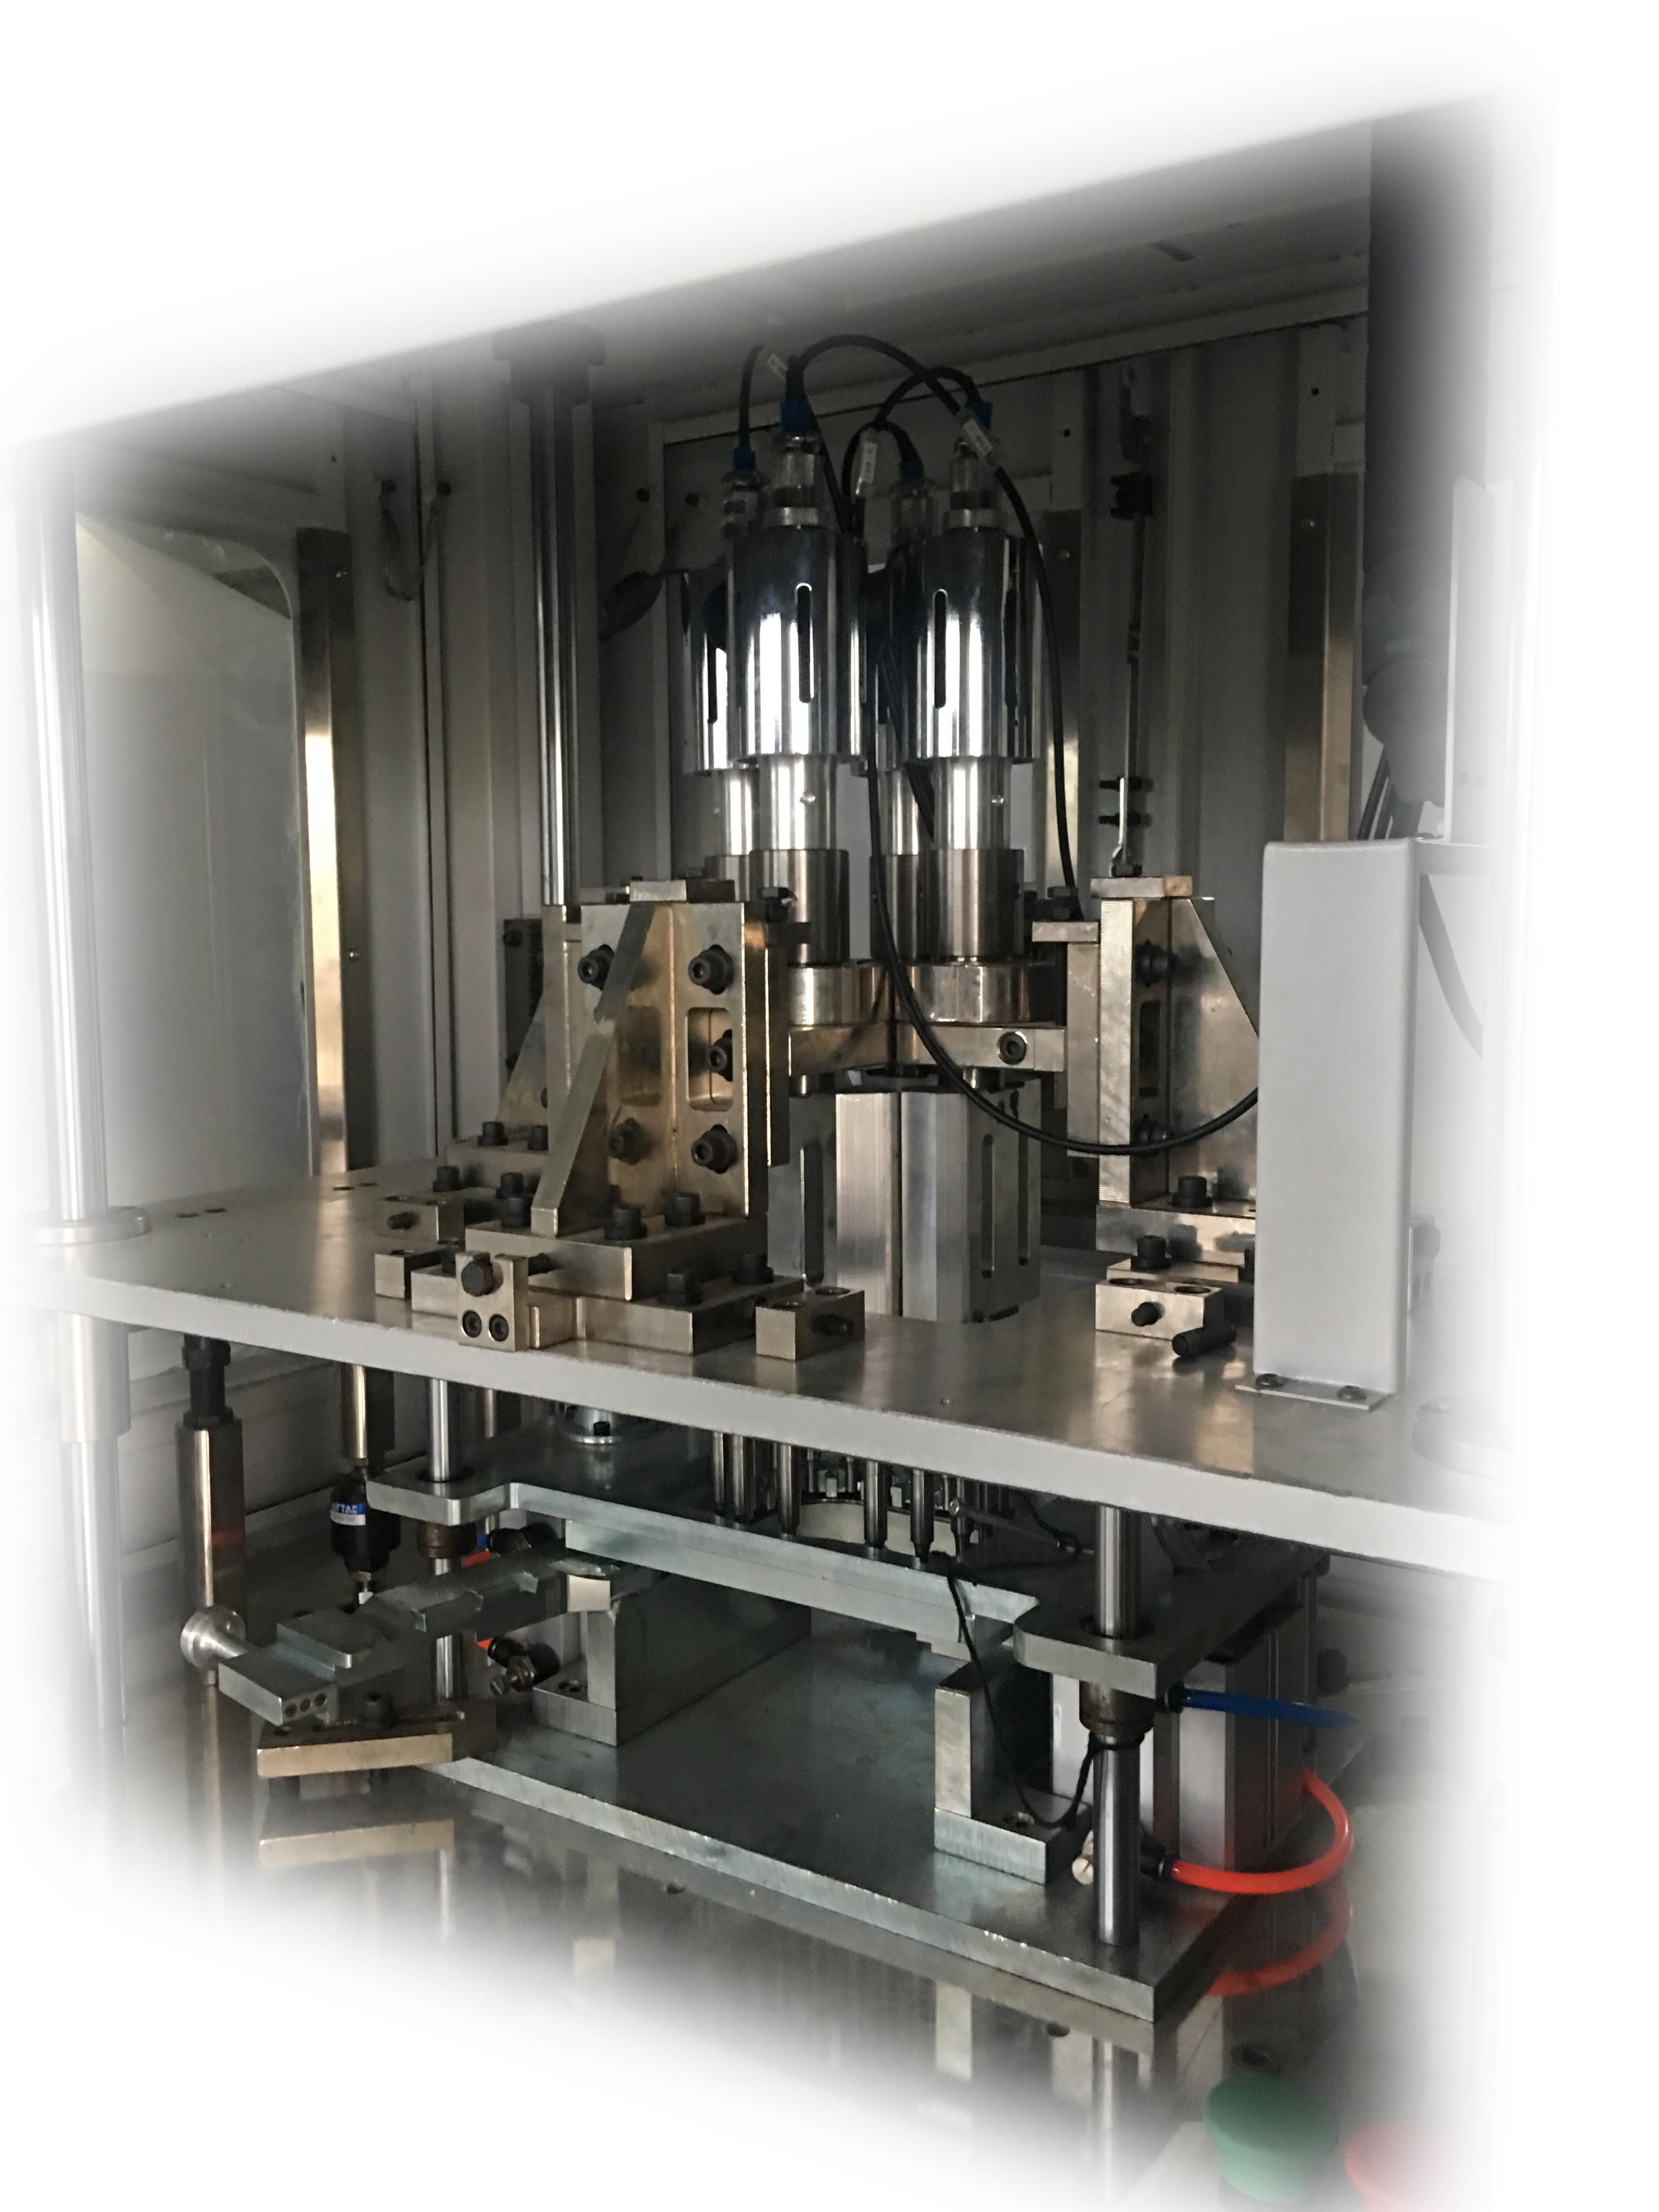 Gas Valve Ultrasonic Welding Stacking Assembling Machine